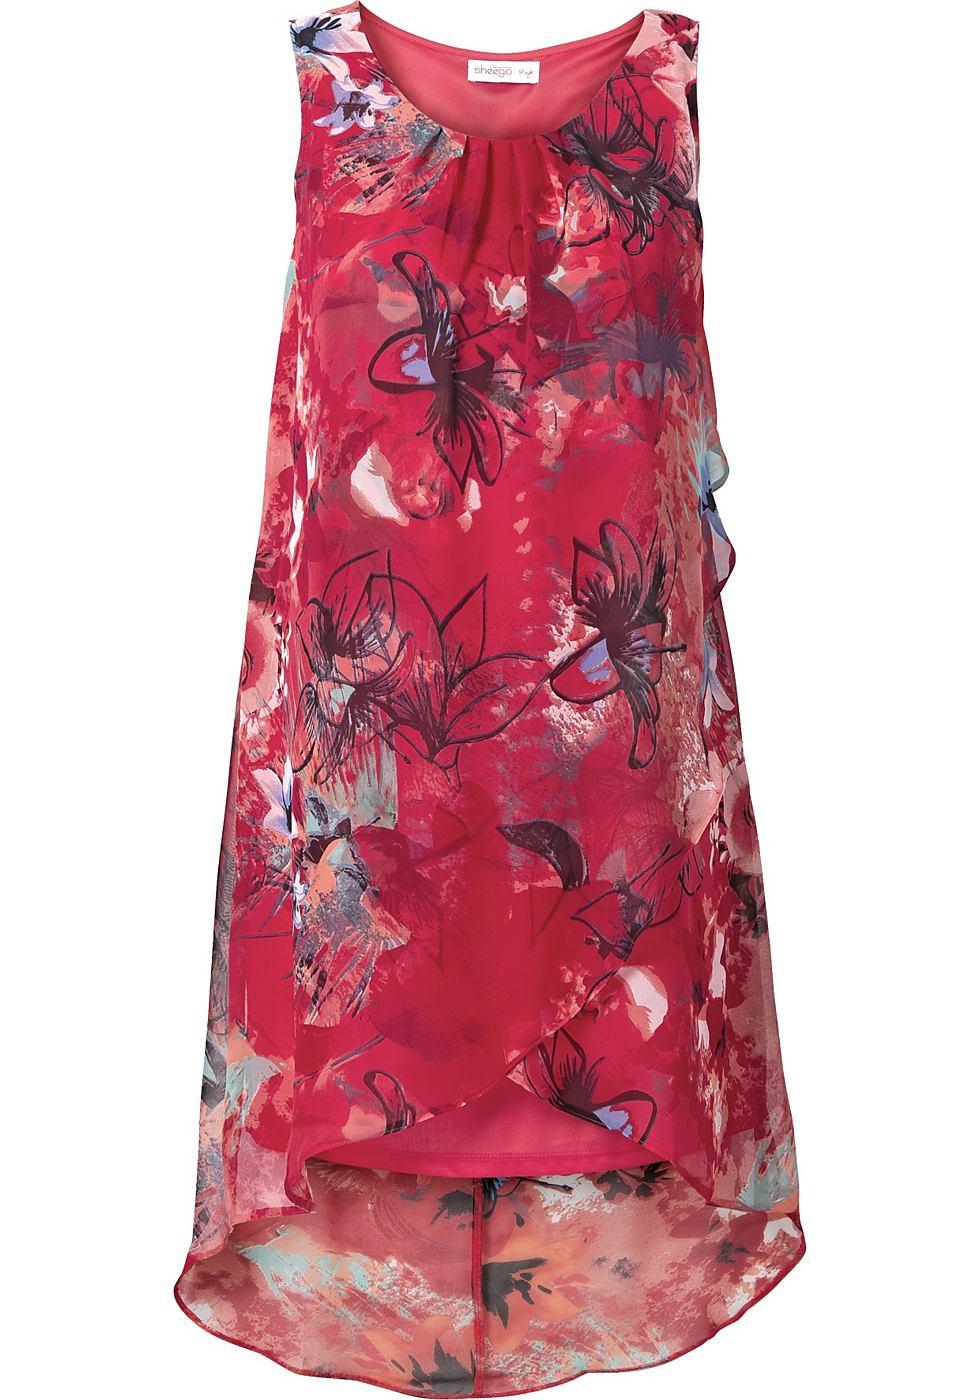 Sheego Style jurk rood